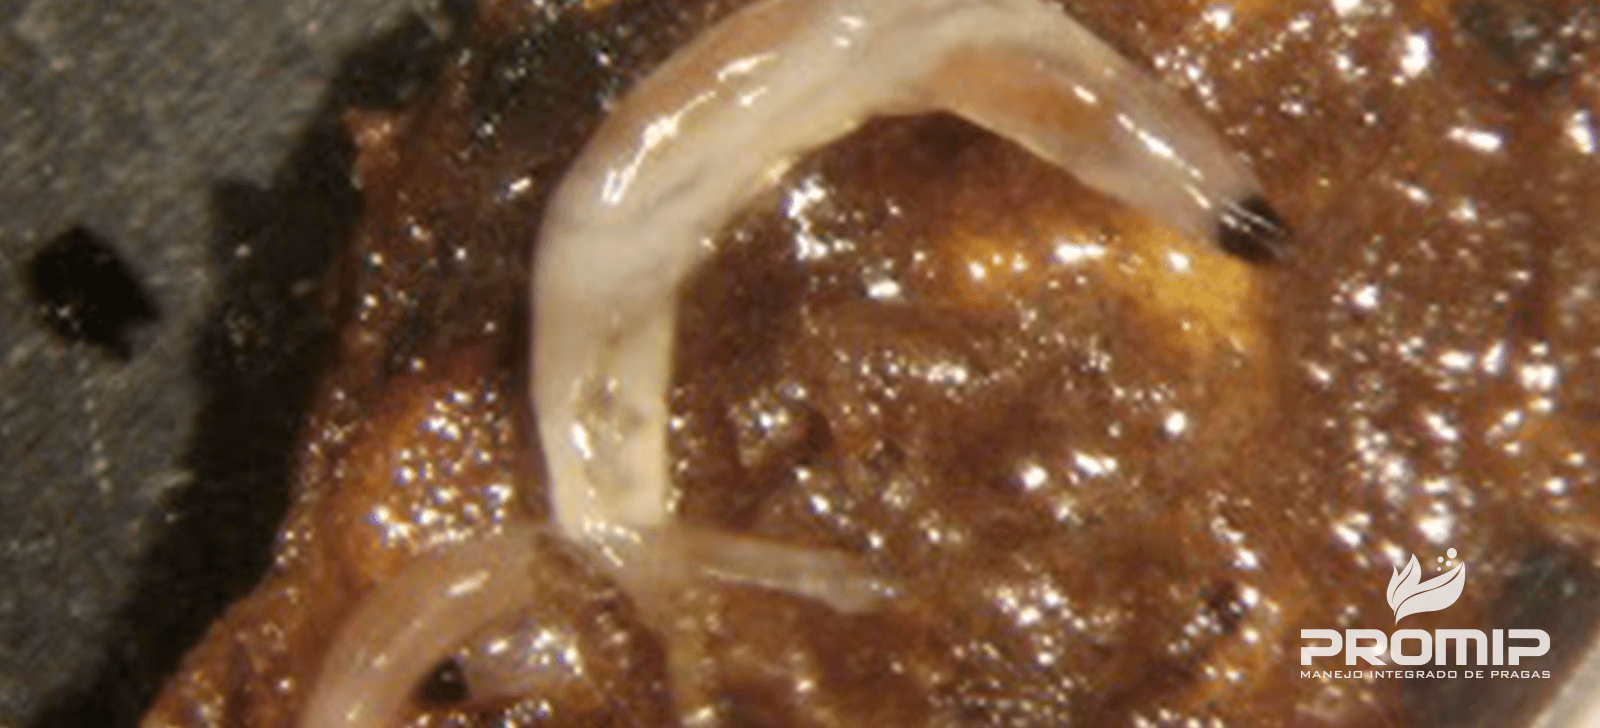 promip manejo integrado de pragas controle biologico larva fungus gnats